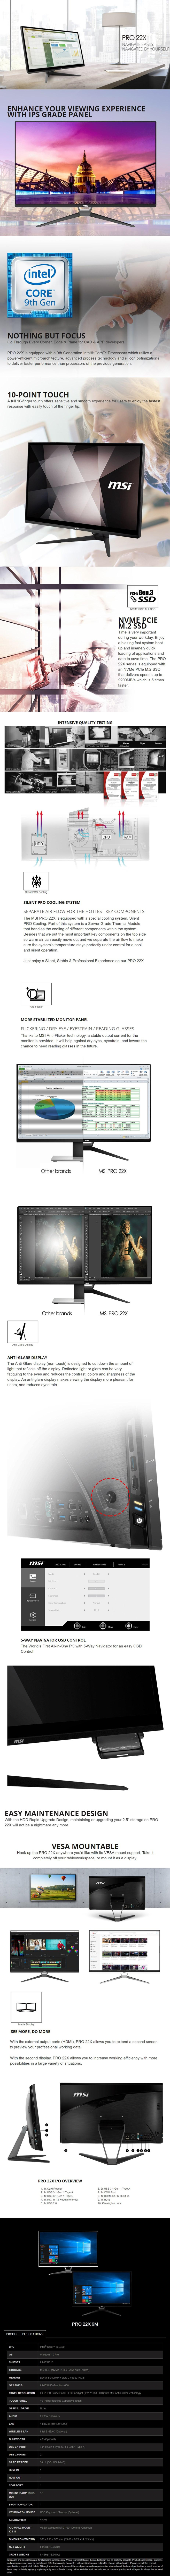 msi-pro-22xt-9m-215-allinone-desktop-pc-i39100-8gb-512gb-win10p-white-ac26713-12.jpg